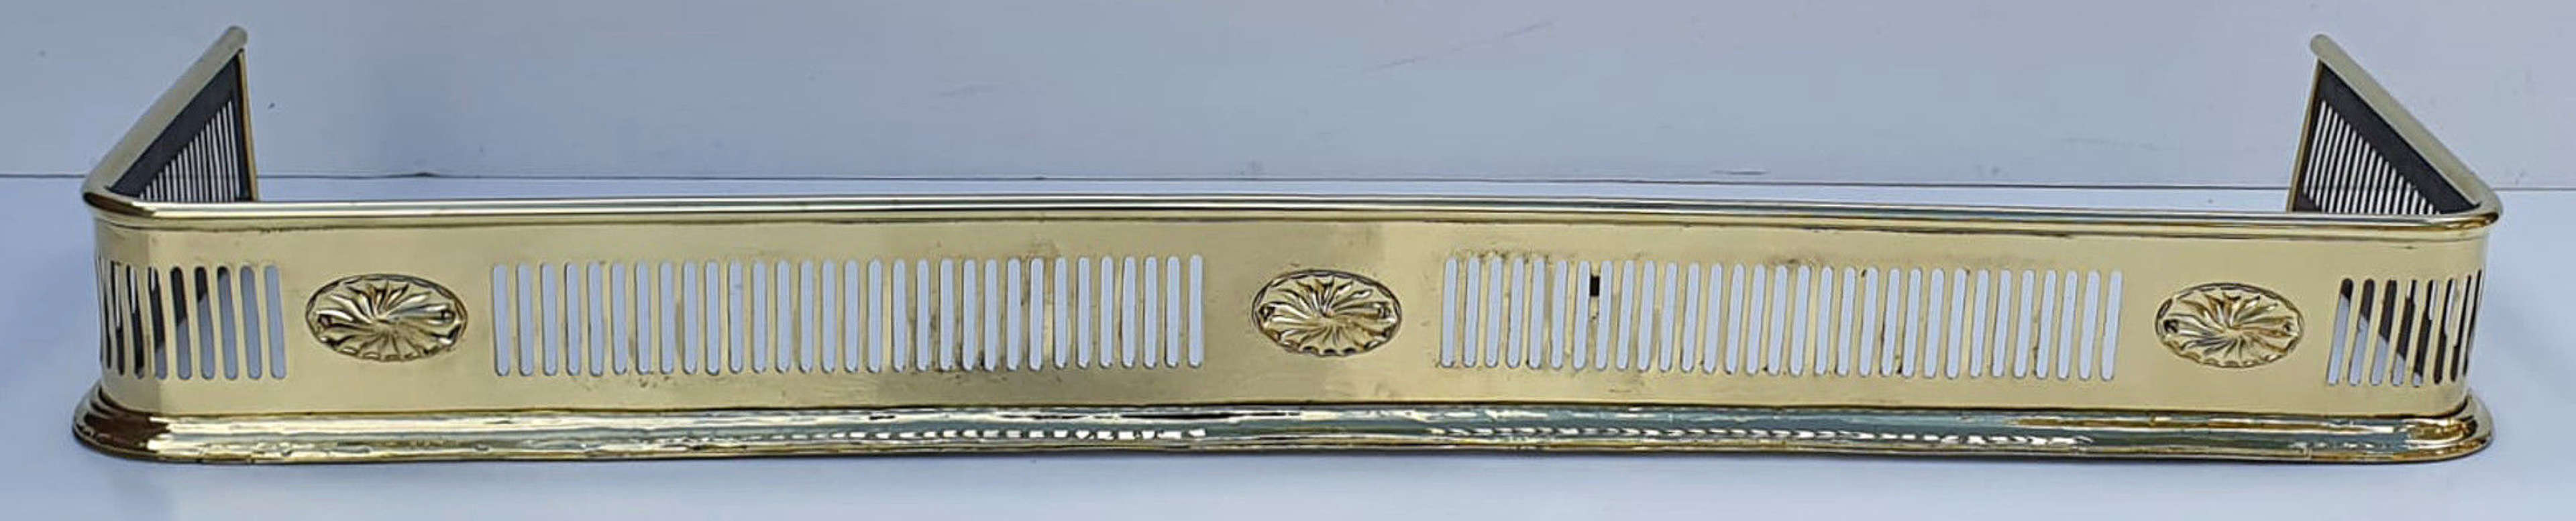 Fully Restored 19th Century Neat Size Brass Fender